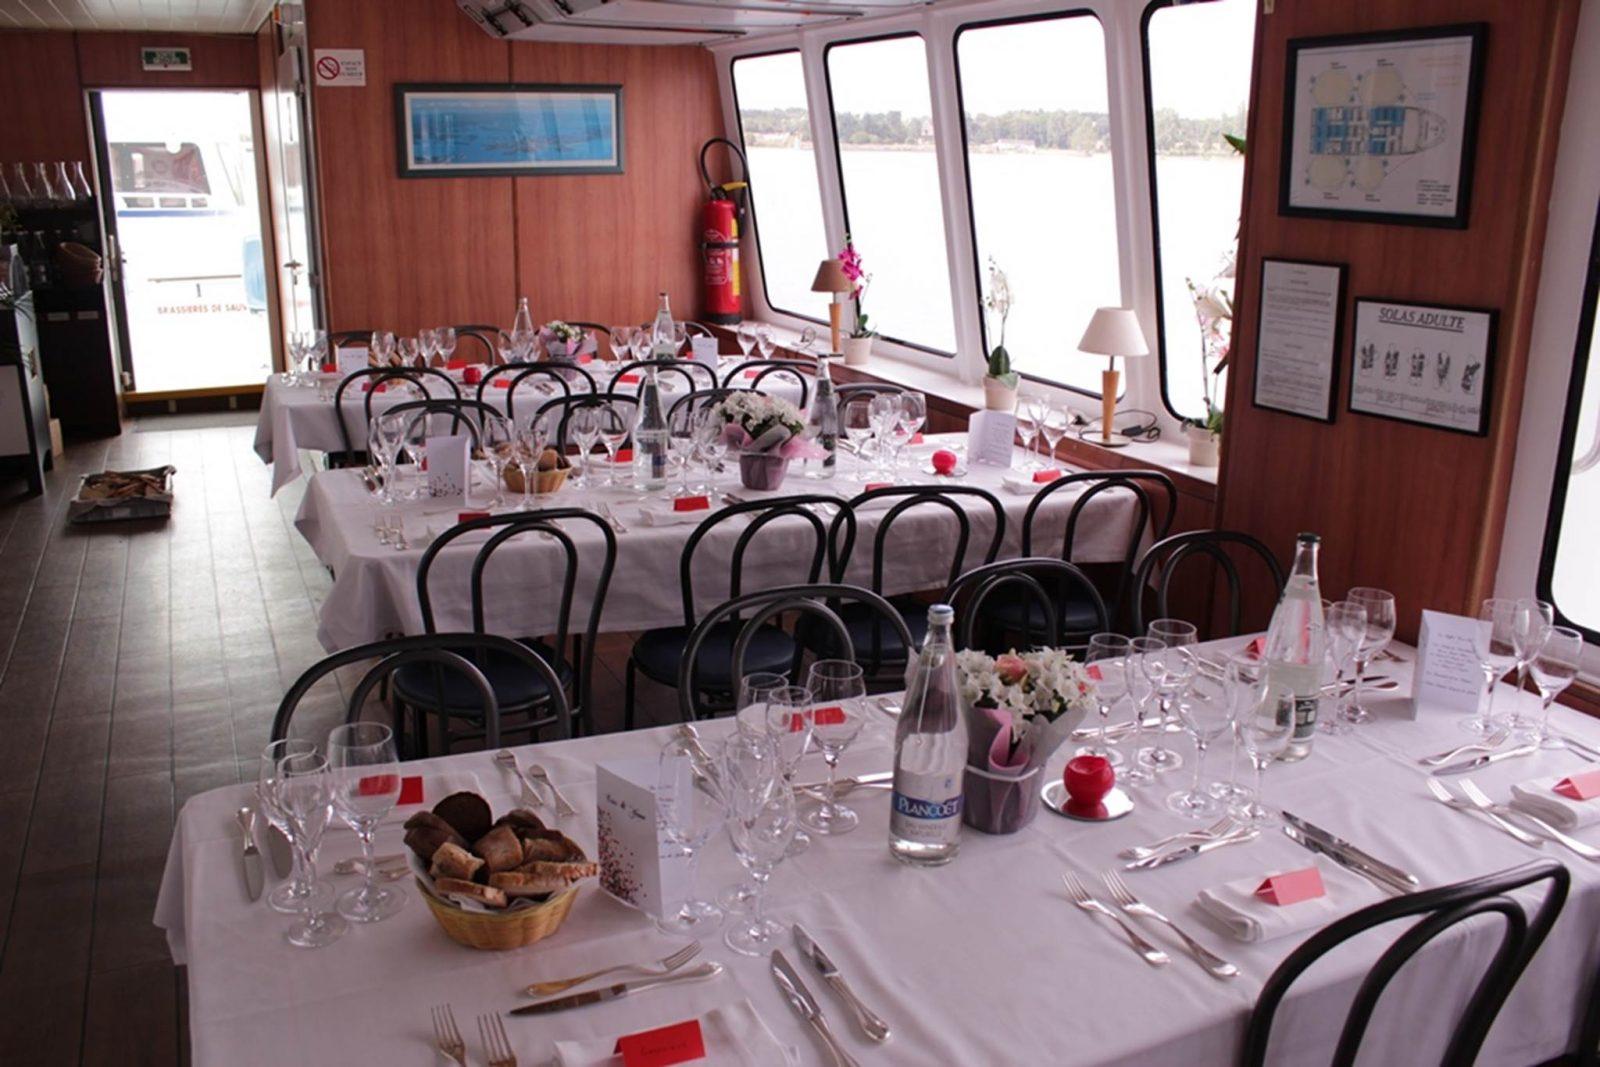 Bateau-Restaurant-Le-Mor-Bihan-Navix-Vannes-Golfe-du-Morbihan-Bretagne sud